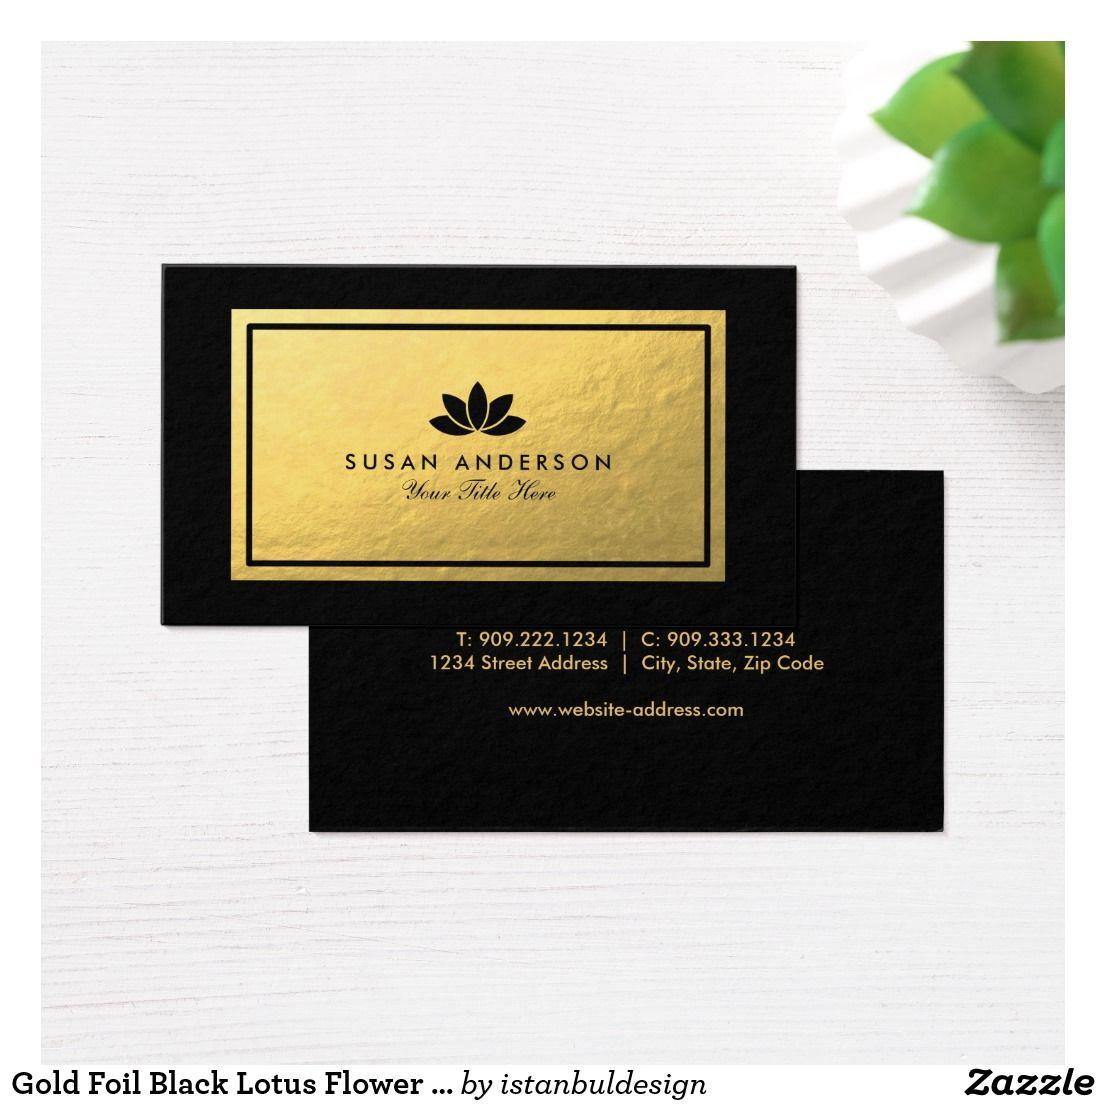 Gold Foil Black Lotus Flower Business Card | Business cards